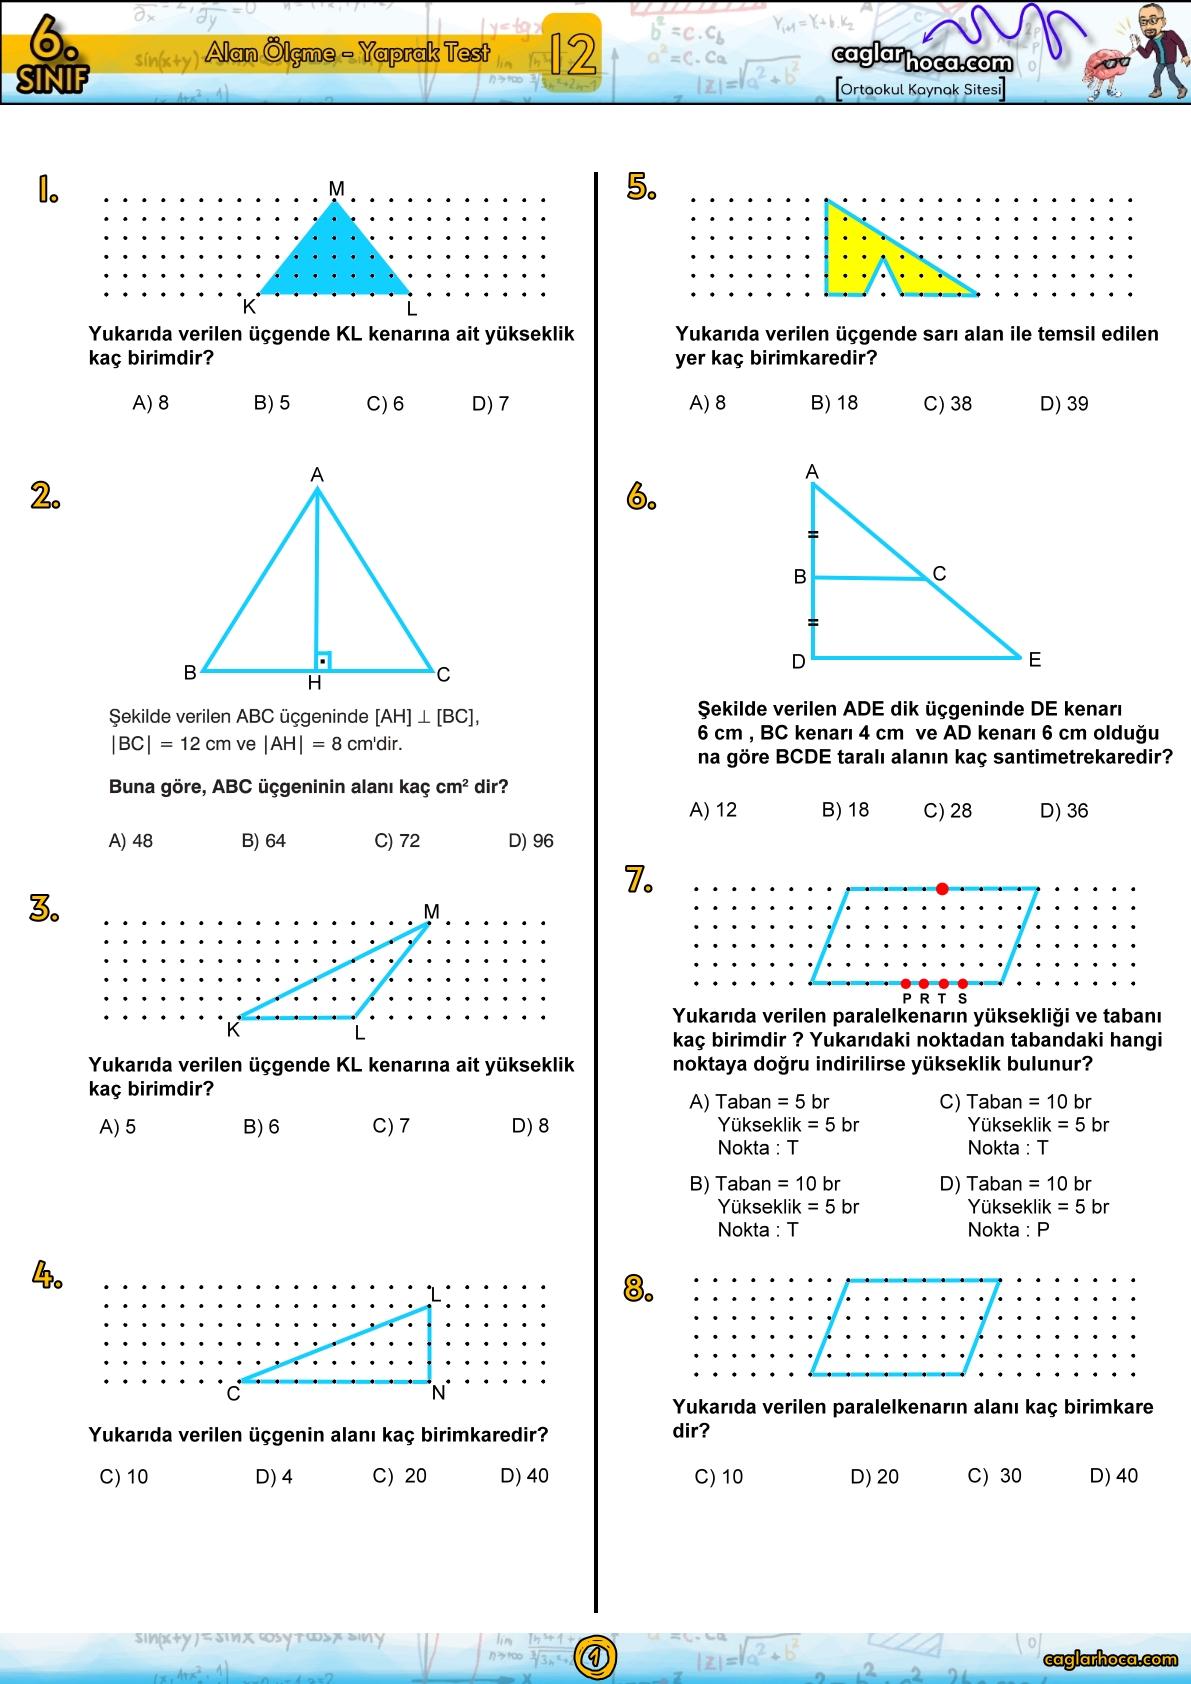 6.sınıf 12.ünite alan ölçme yaprak test